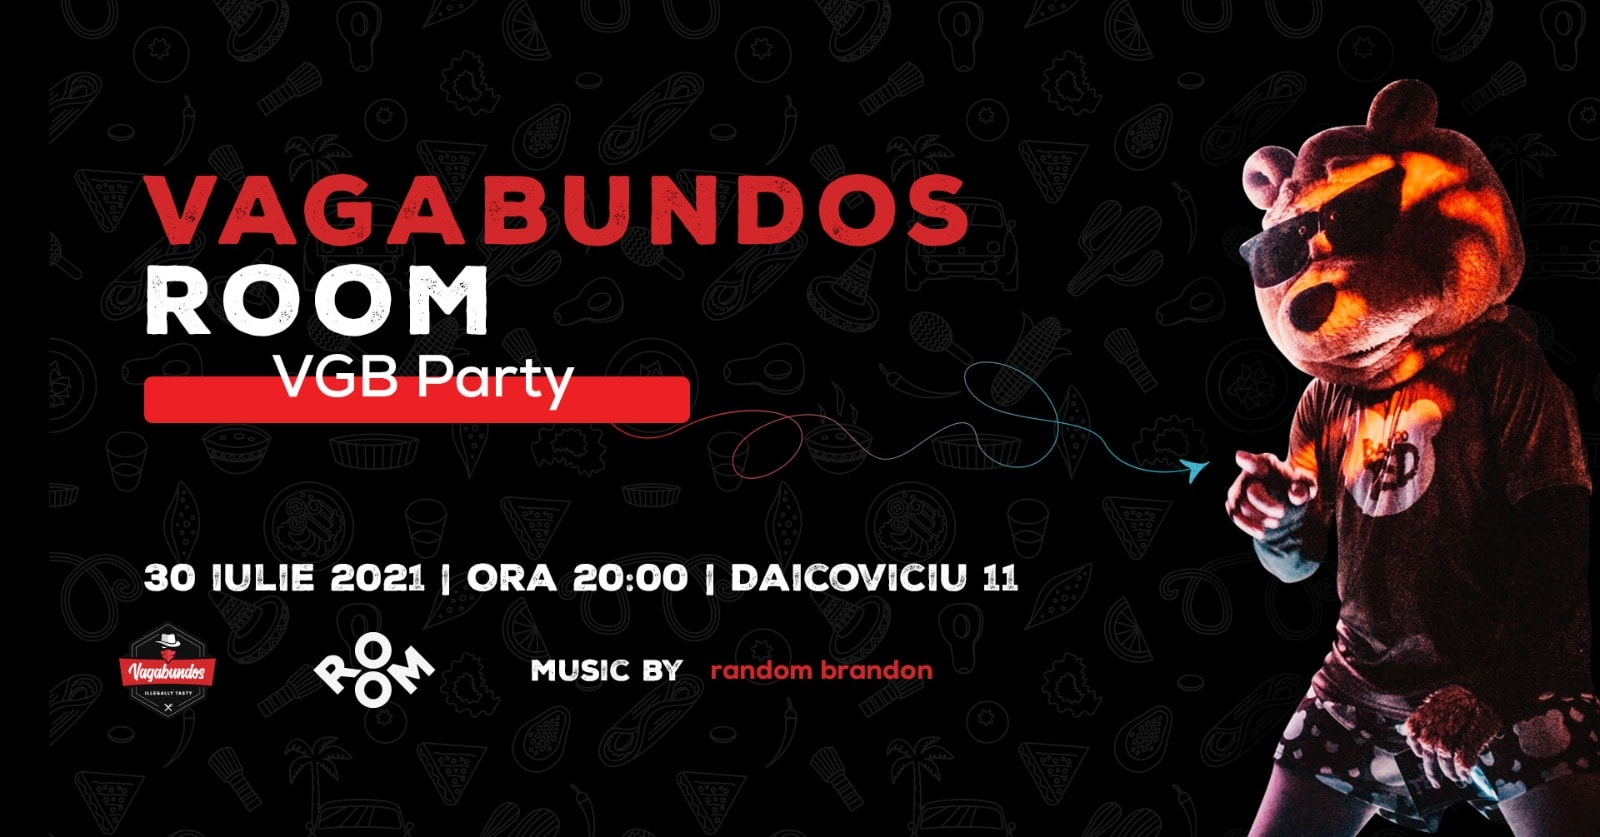 VGB Party